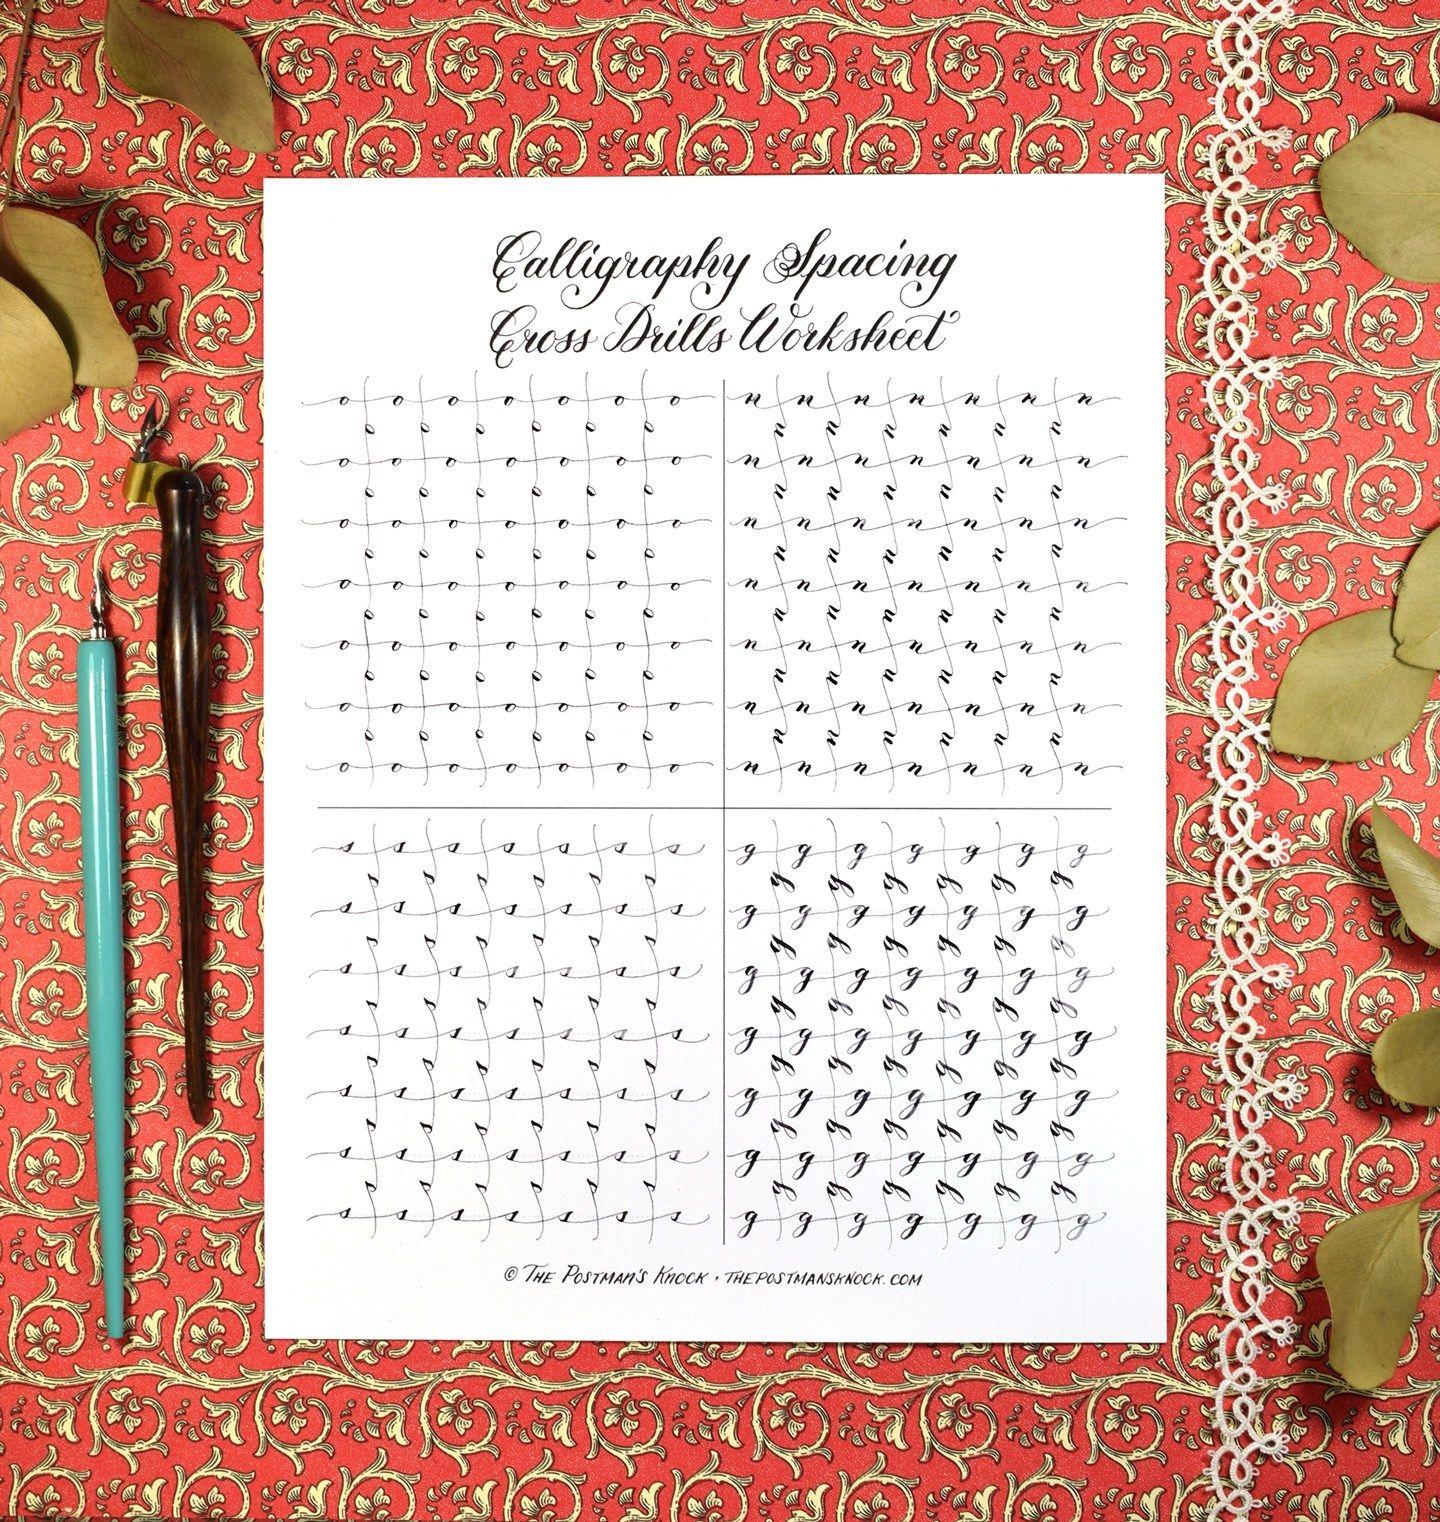 Free Calligraphy Spacing Cross Drills Worksheet